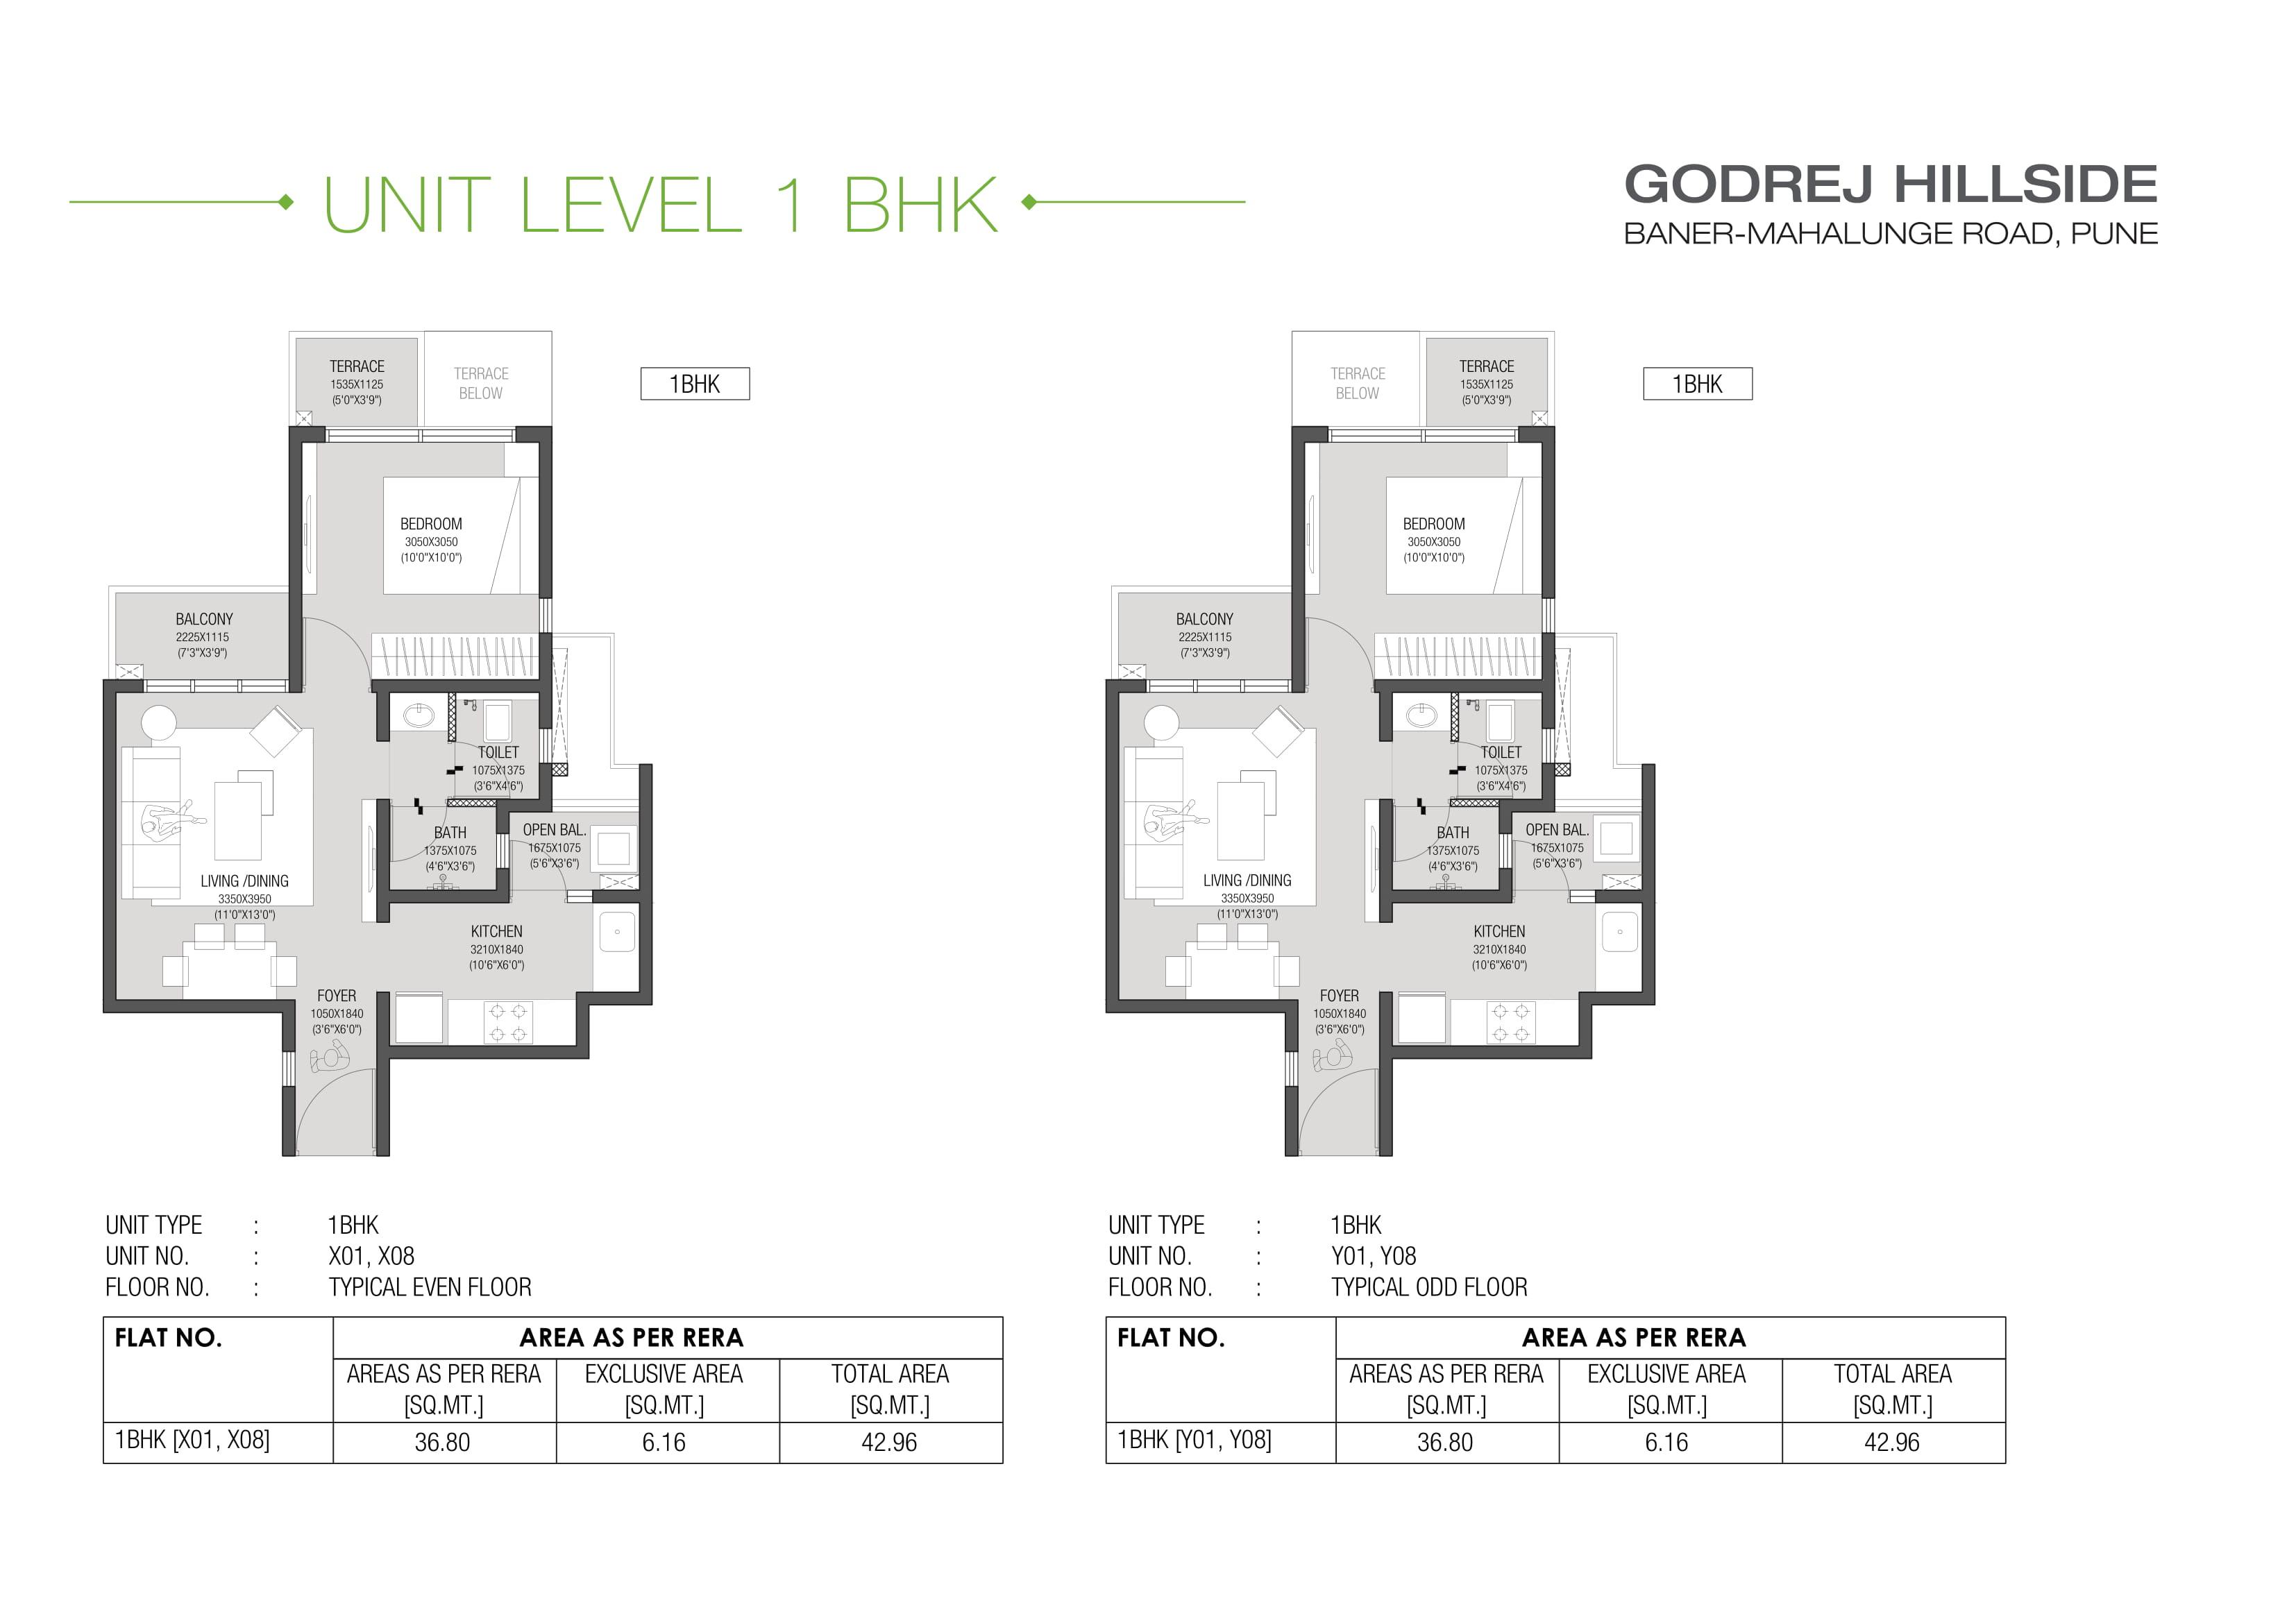 Godrej Hillside Floor Plan 1 BHK